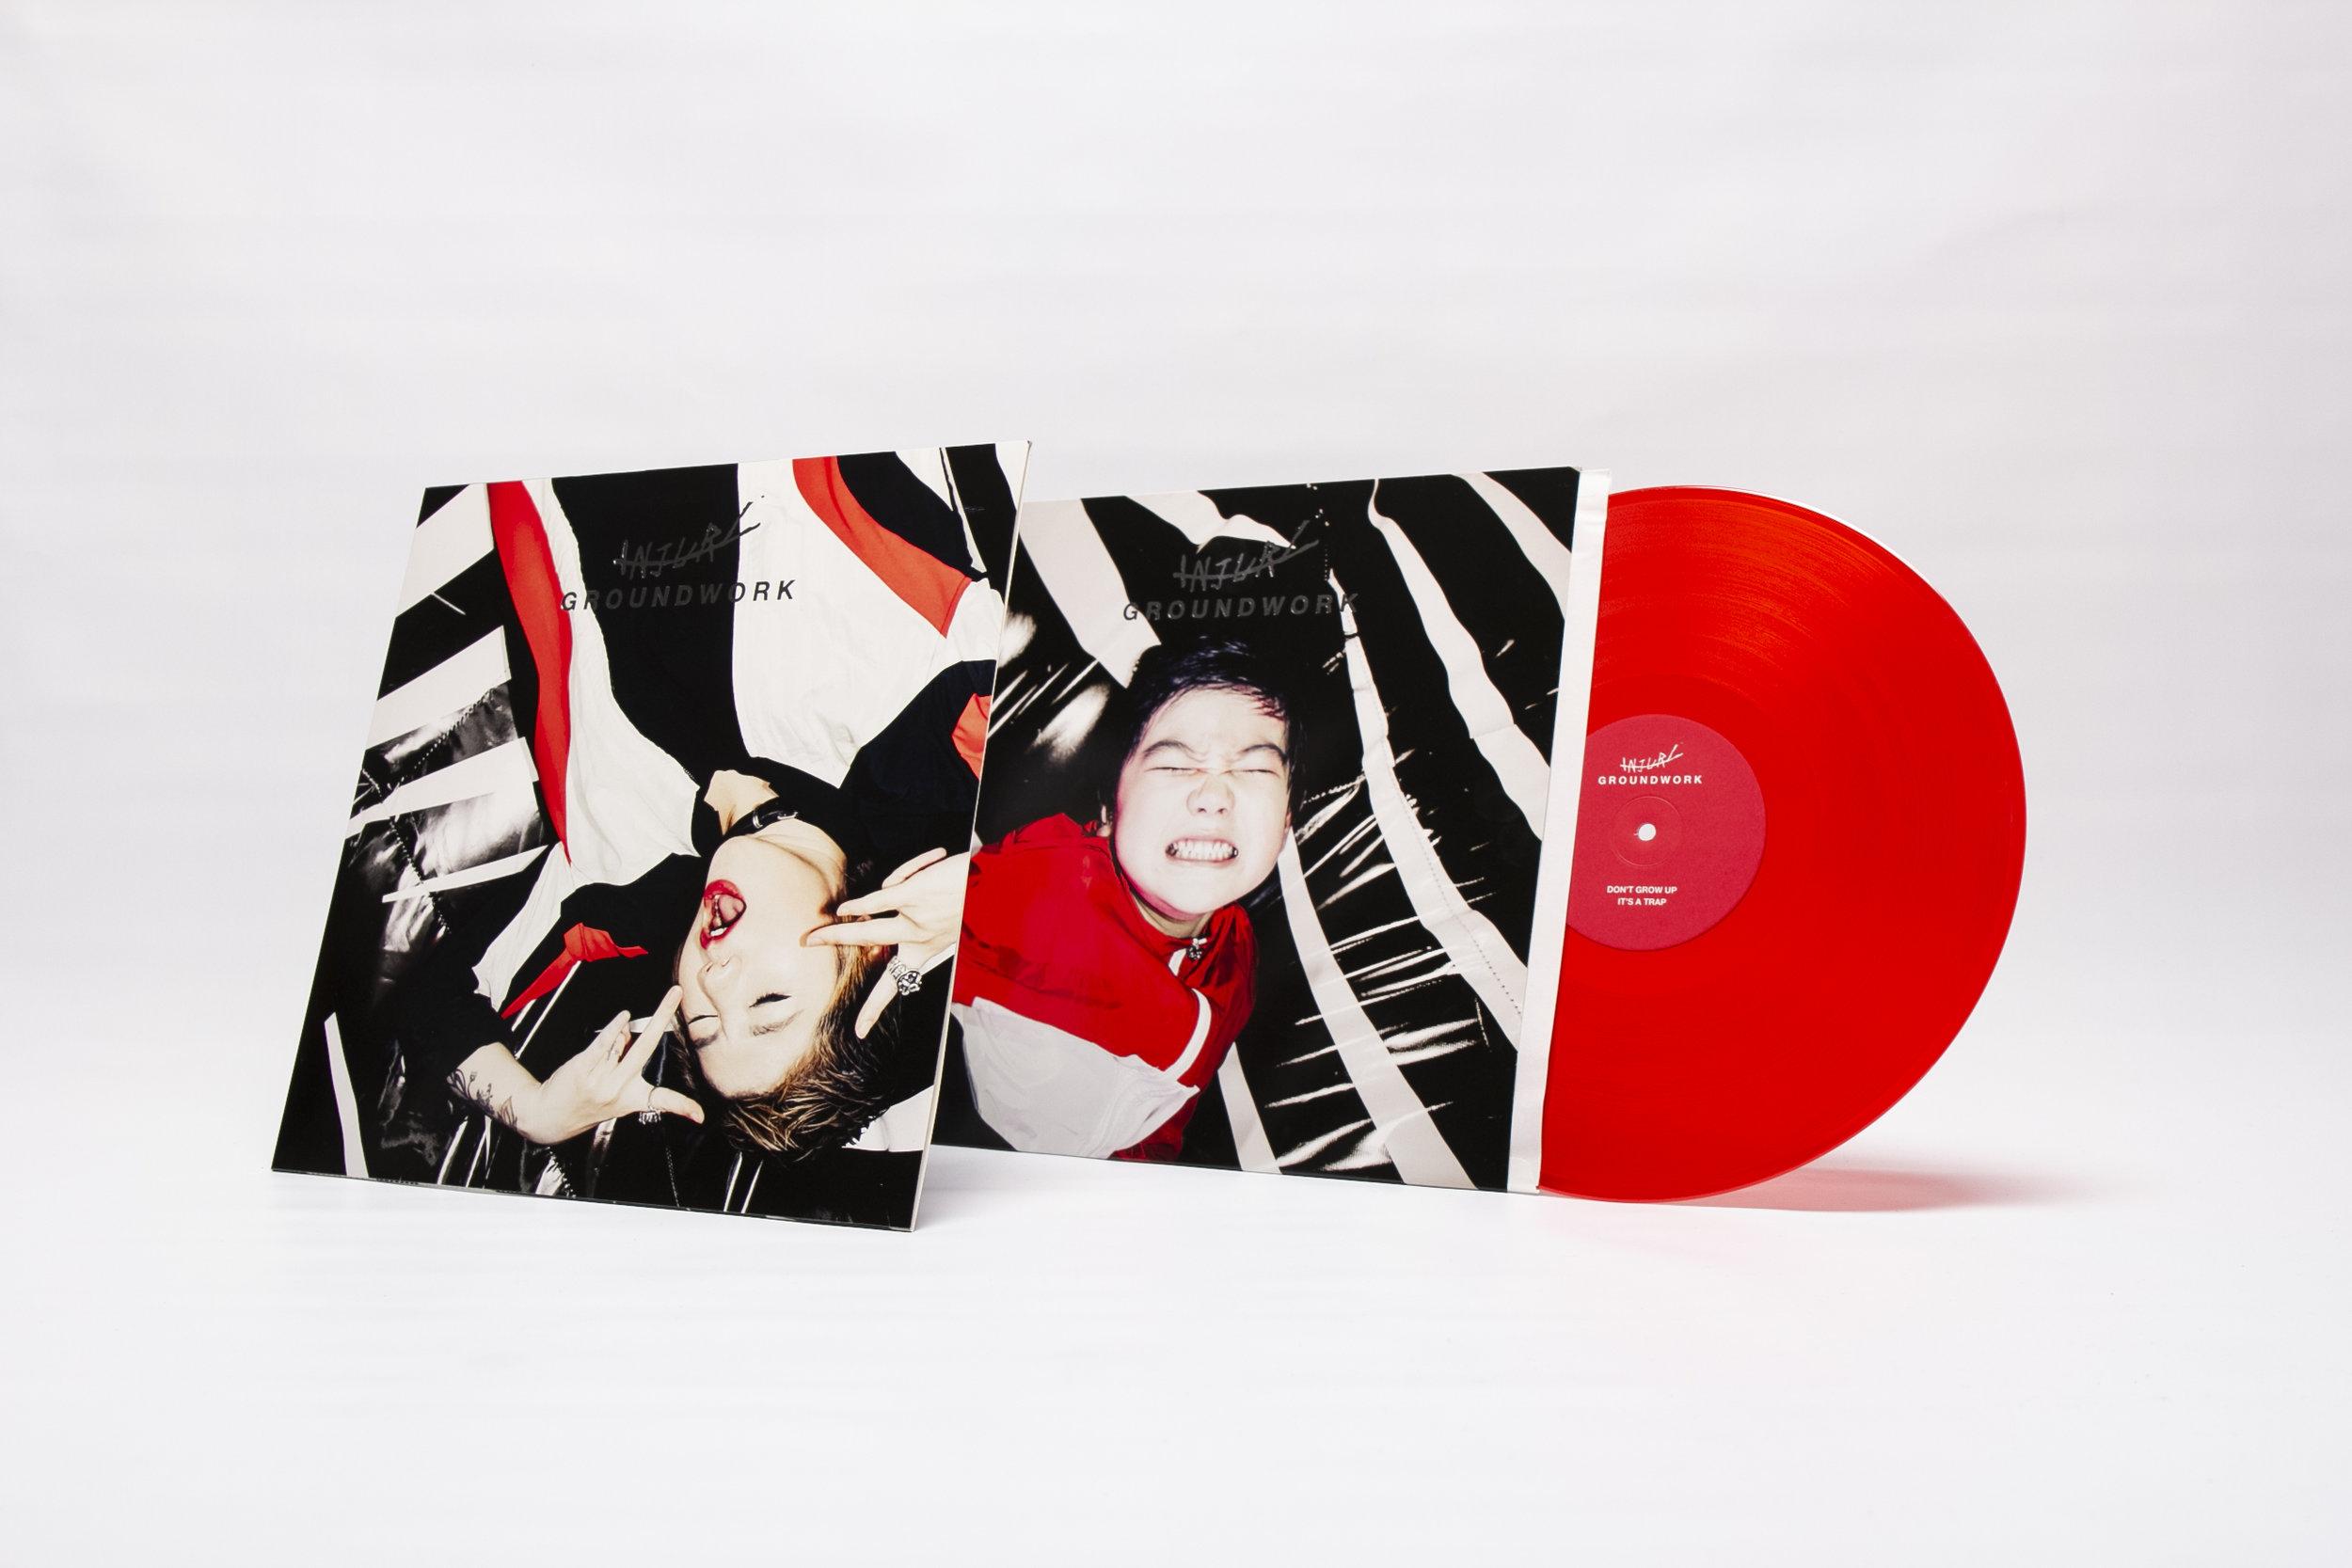 Dual-cover art of INJURY's 'Groundwork' vinyl album